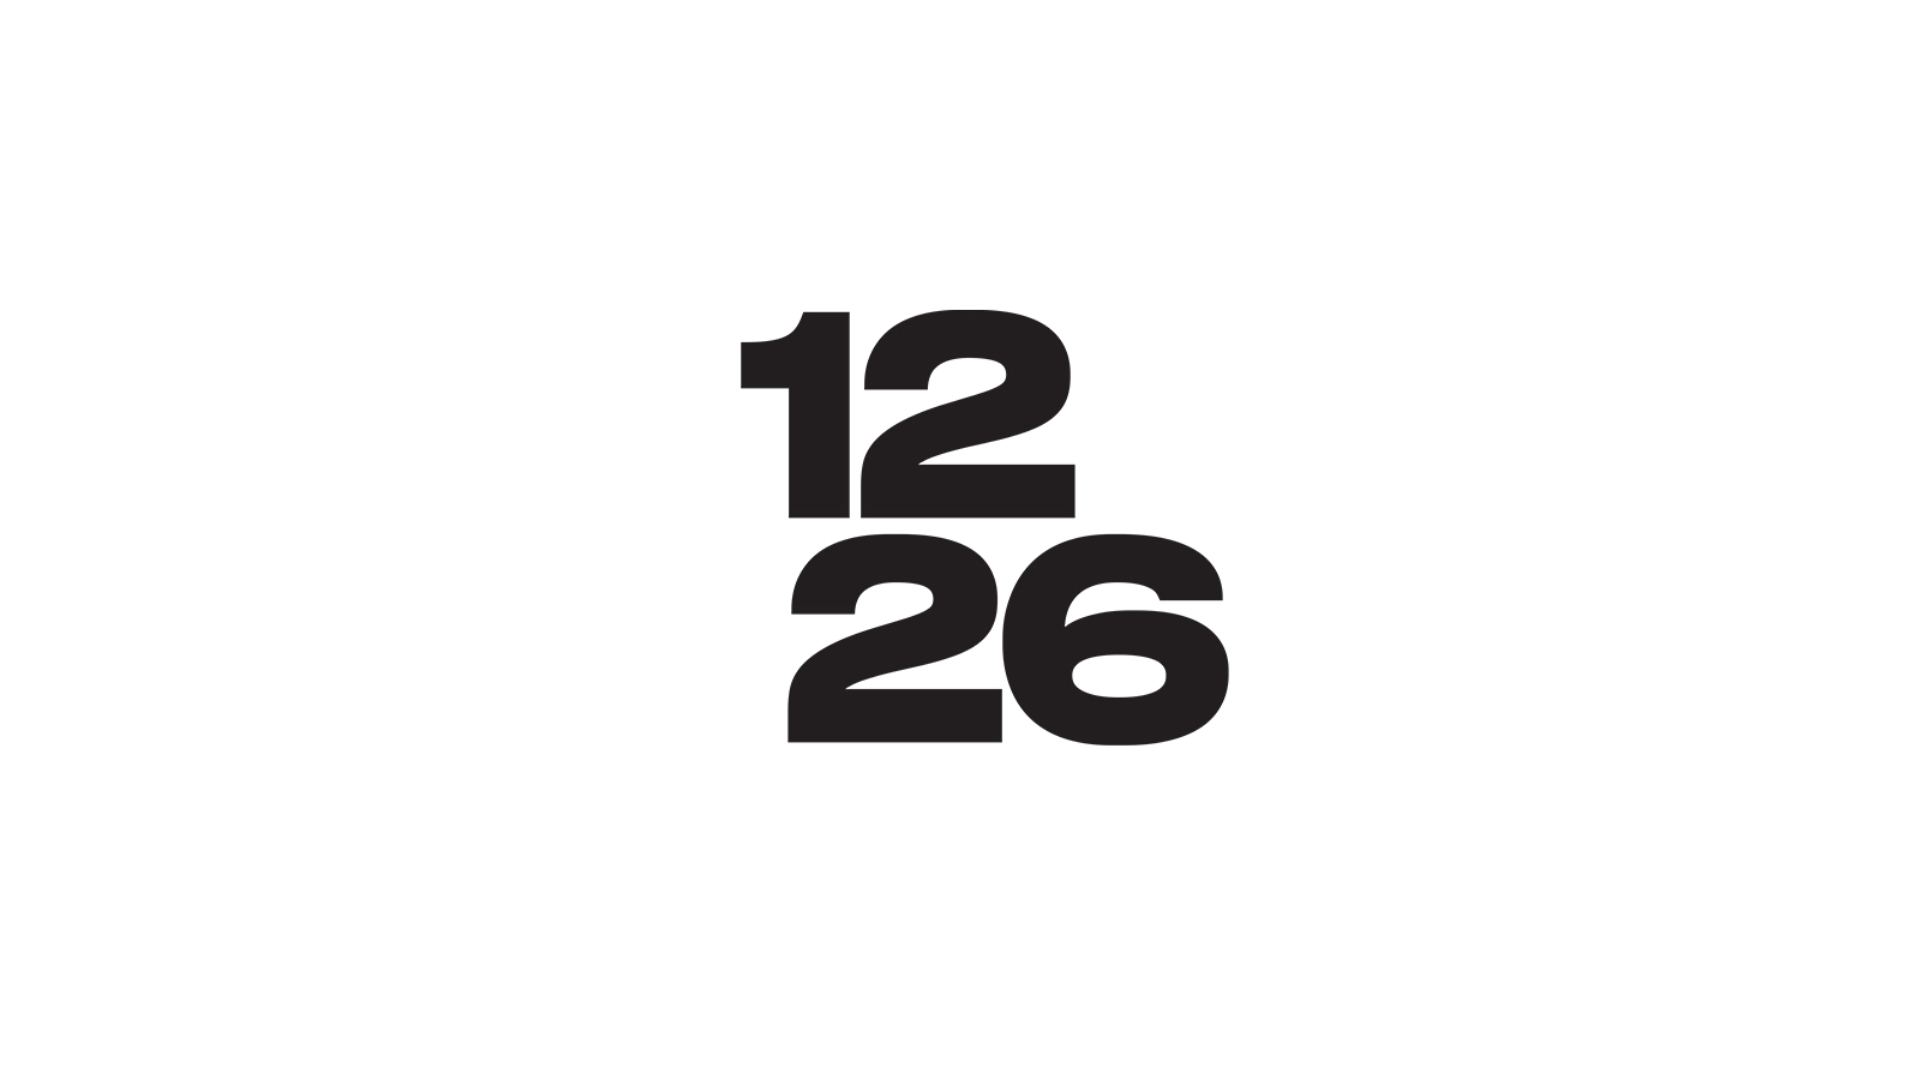 12.26